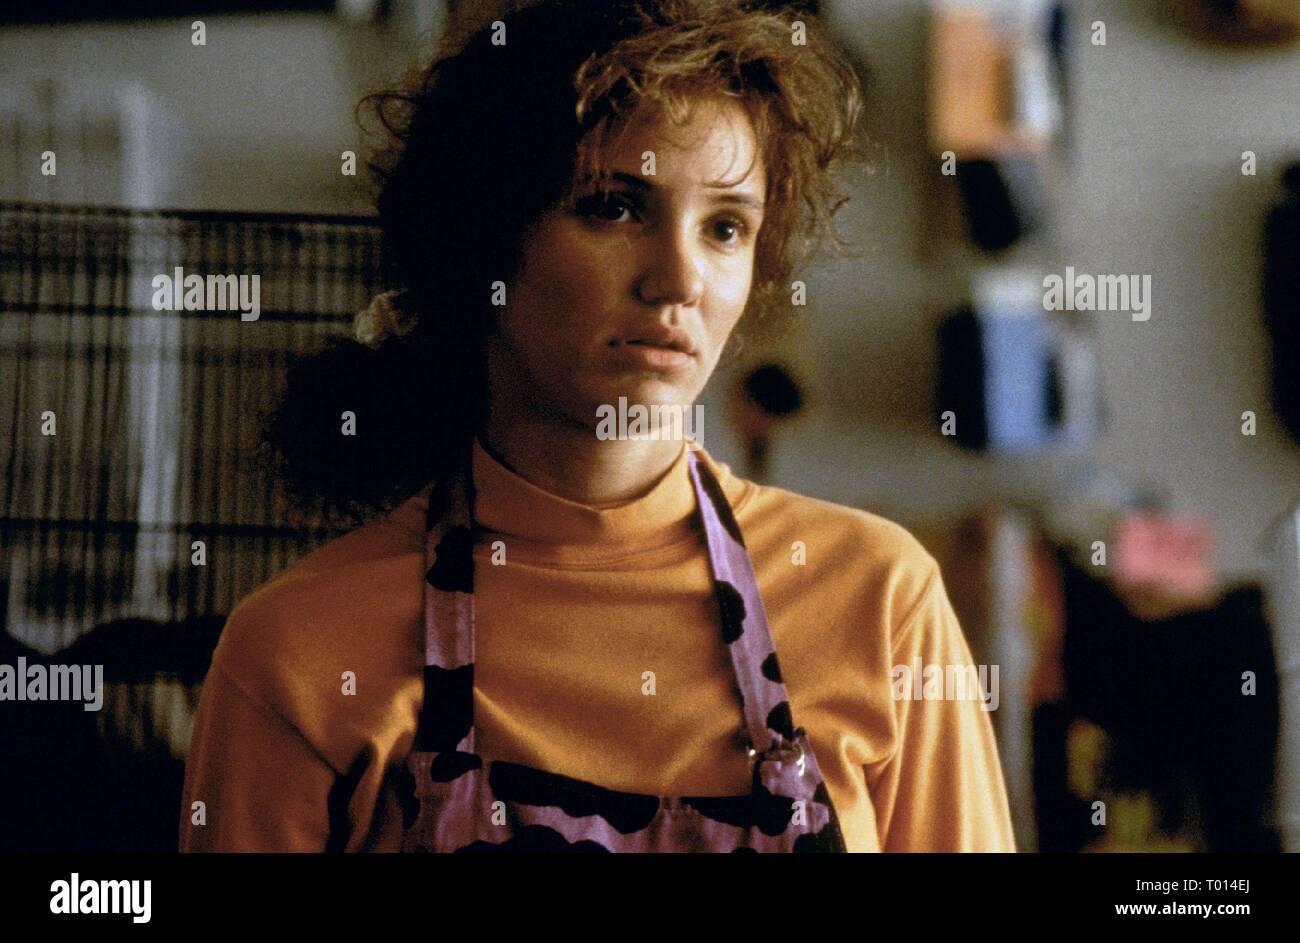 Cameron Diaz Being John Malkovich 1999 Stock Photo Alamy